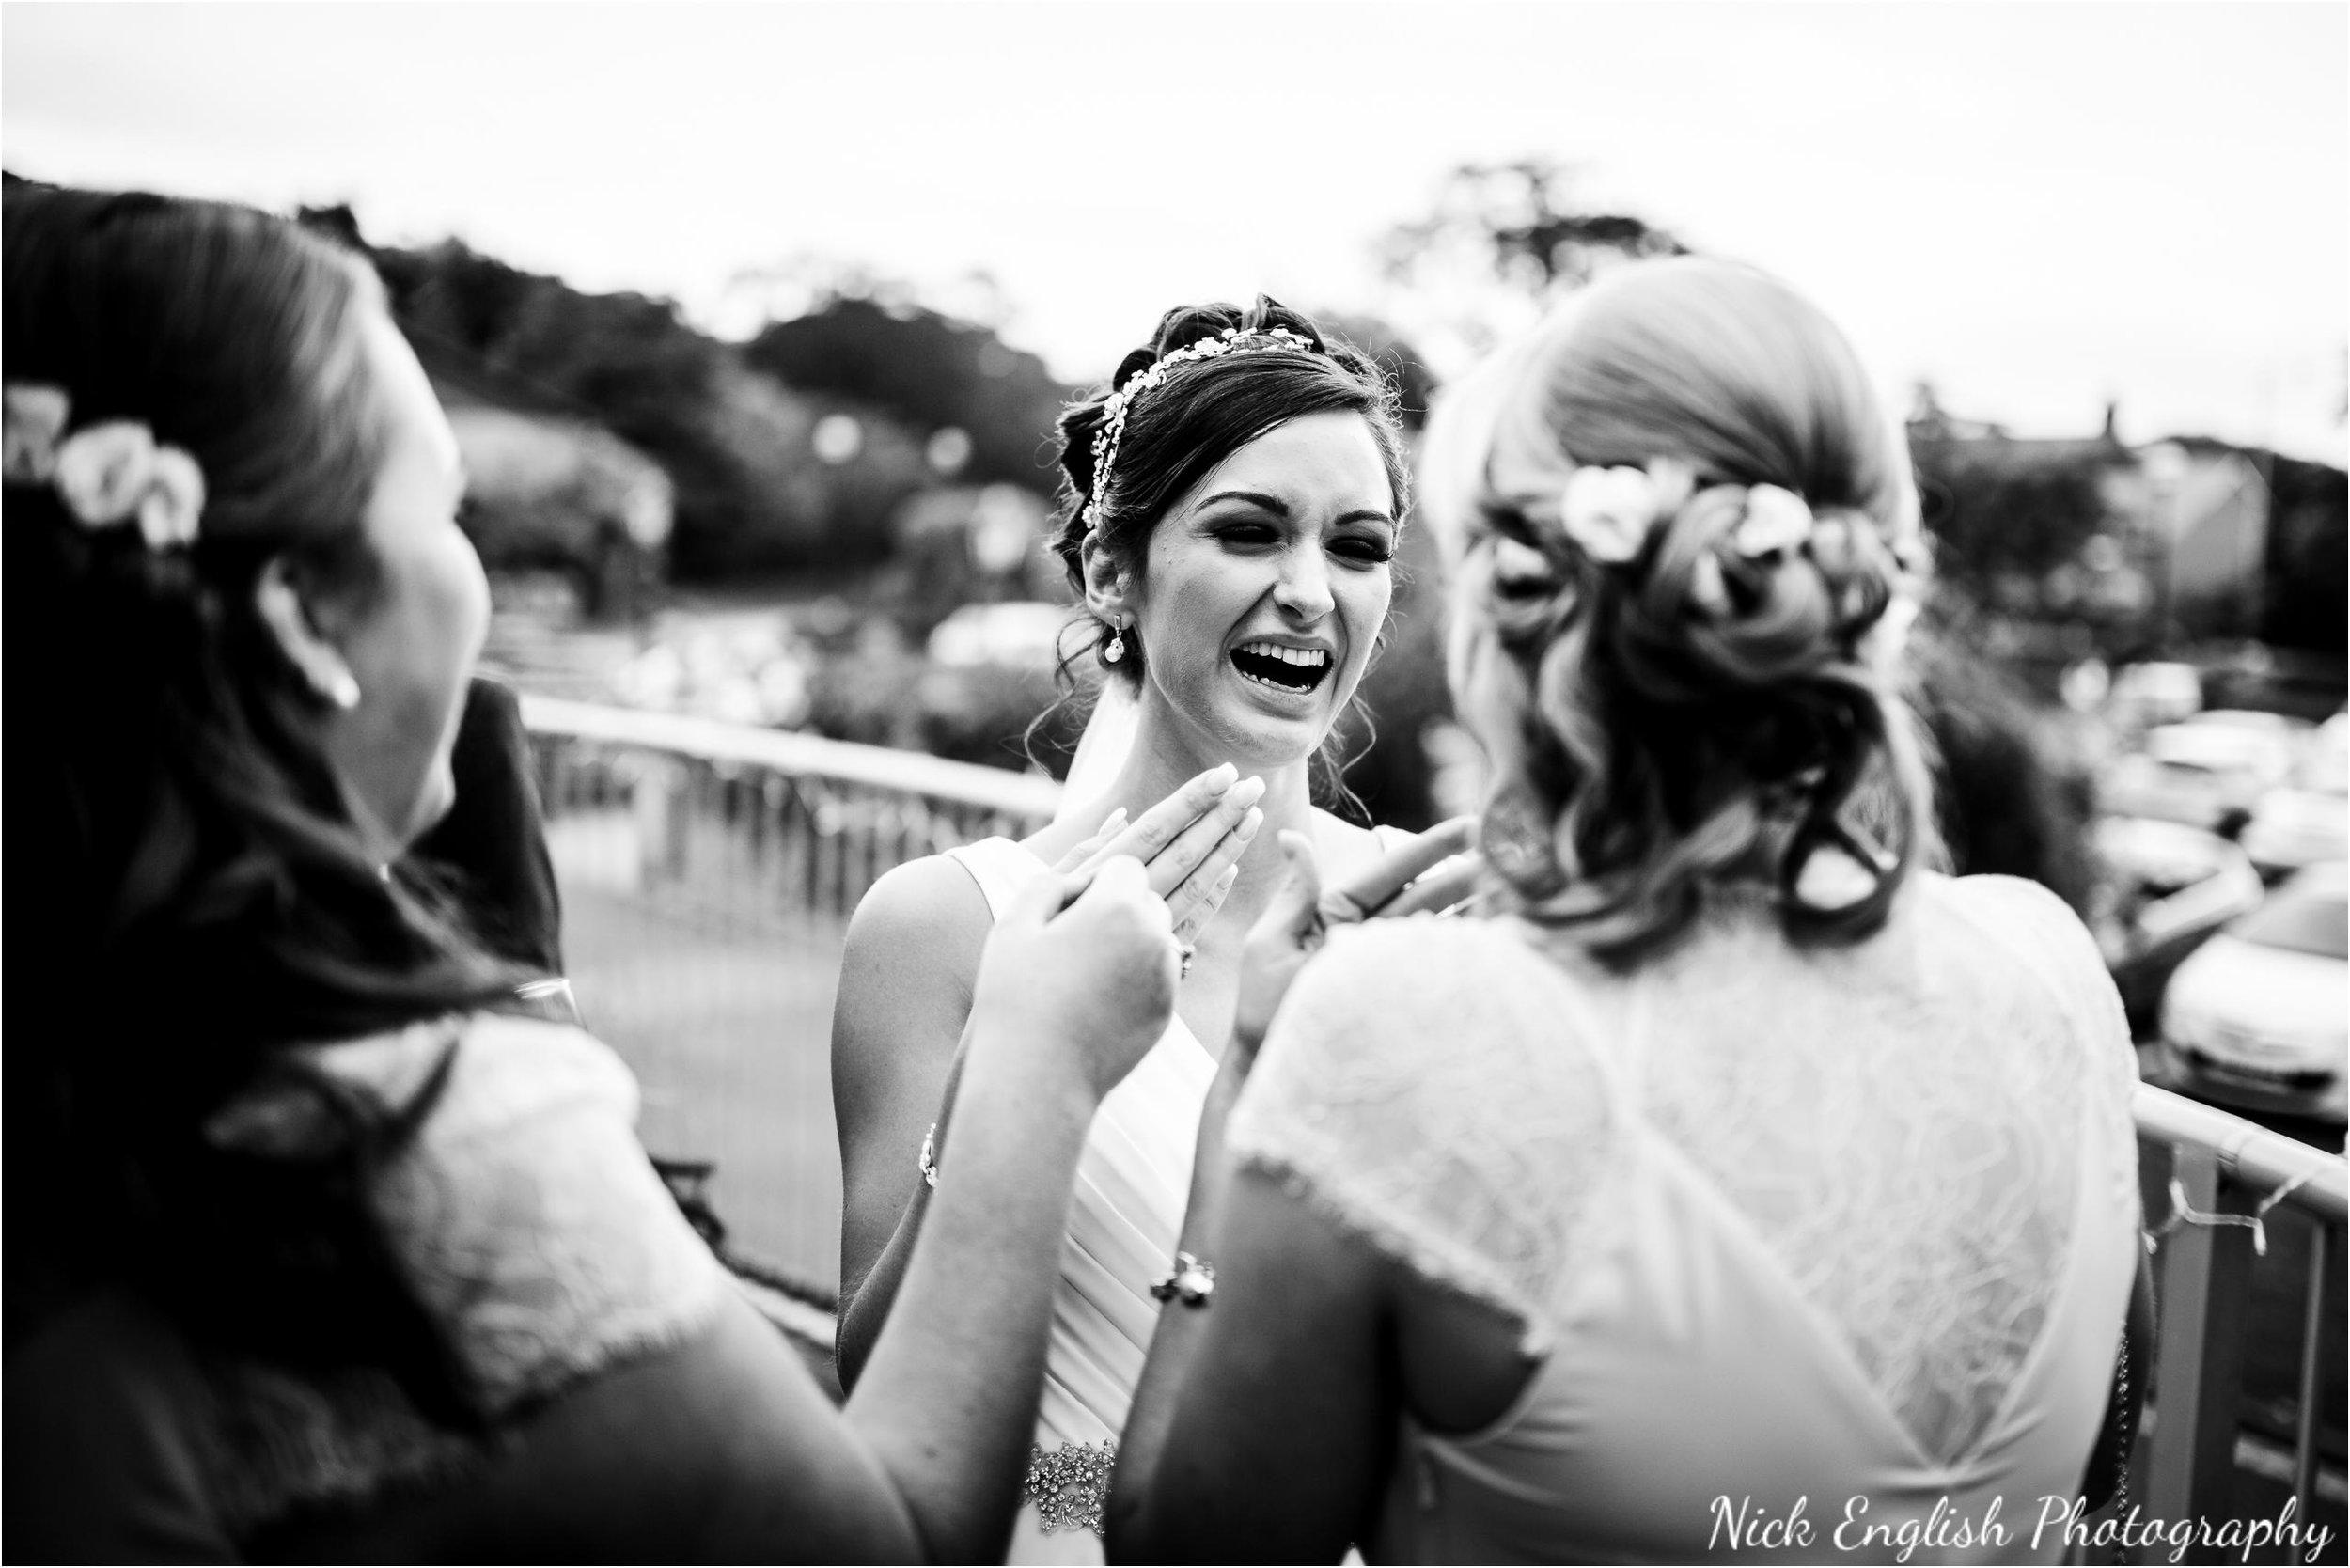 Emily David Wedding Photographs at Barton Grange Preston by Nick English Photography 210jpg.jpeg